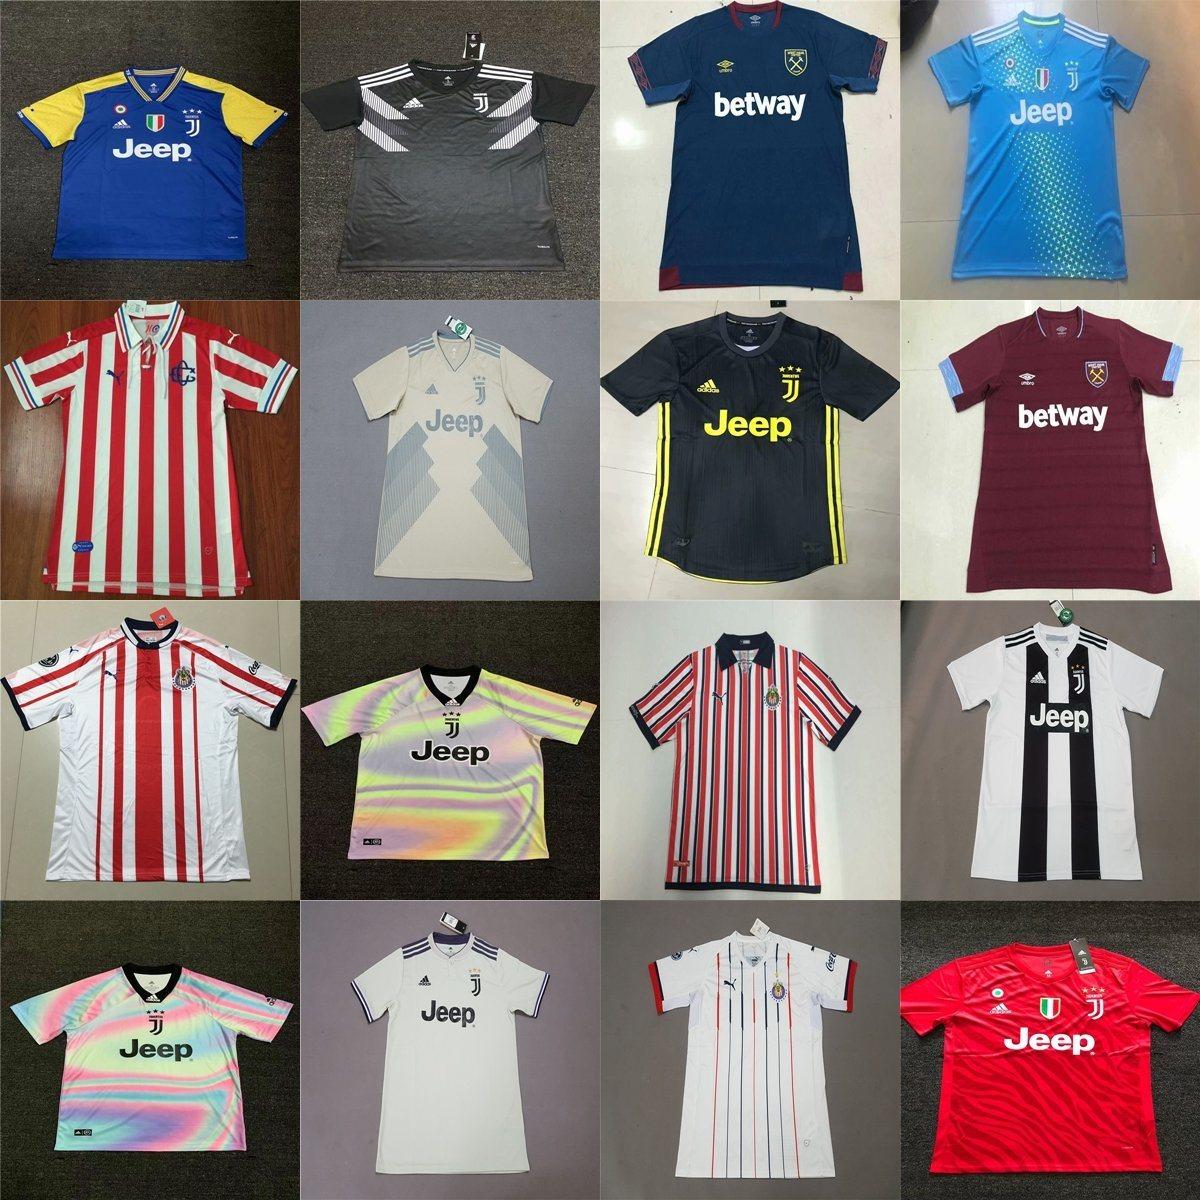 new style 93754 ed8d2 [Hot Item] West Ham Juventus Chivas Home Away Third Football Soccer Jerseys